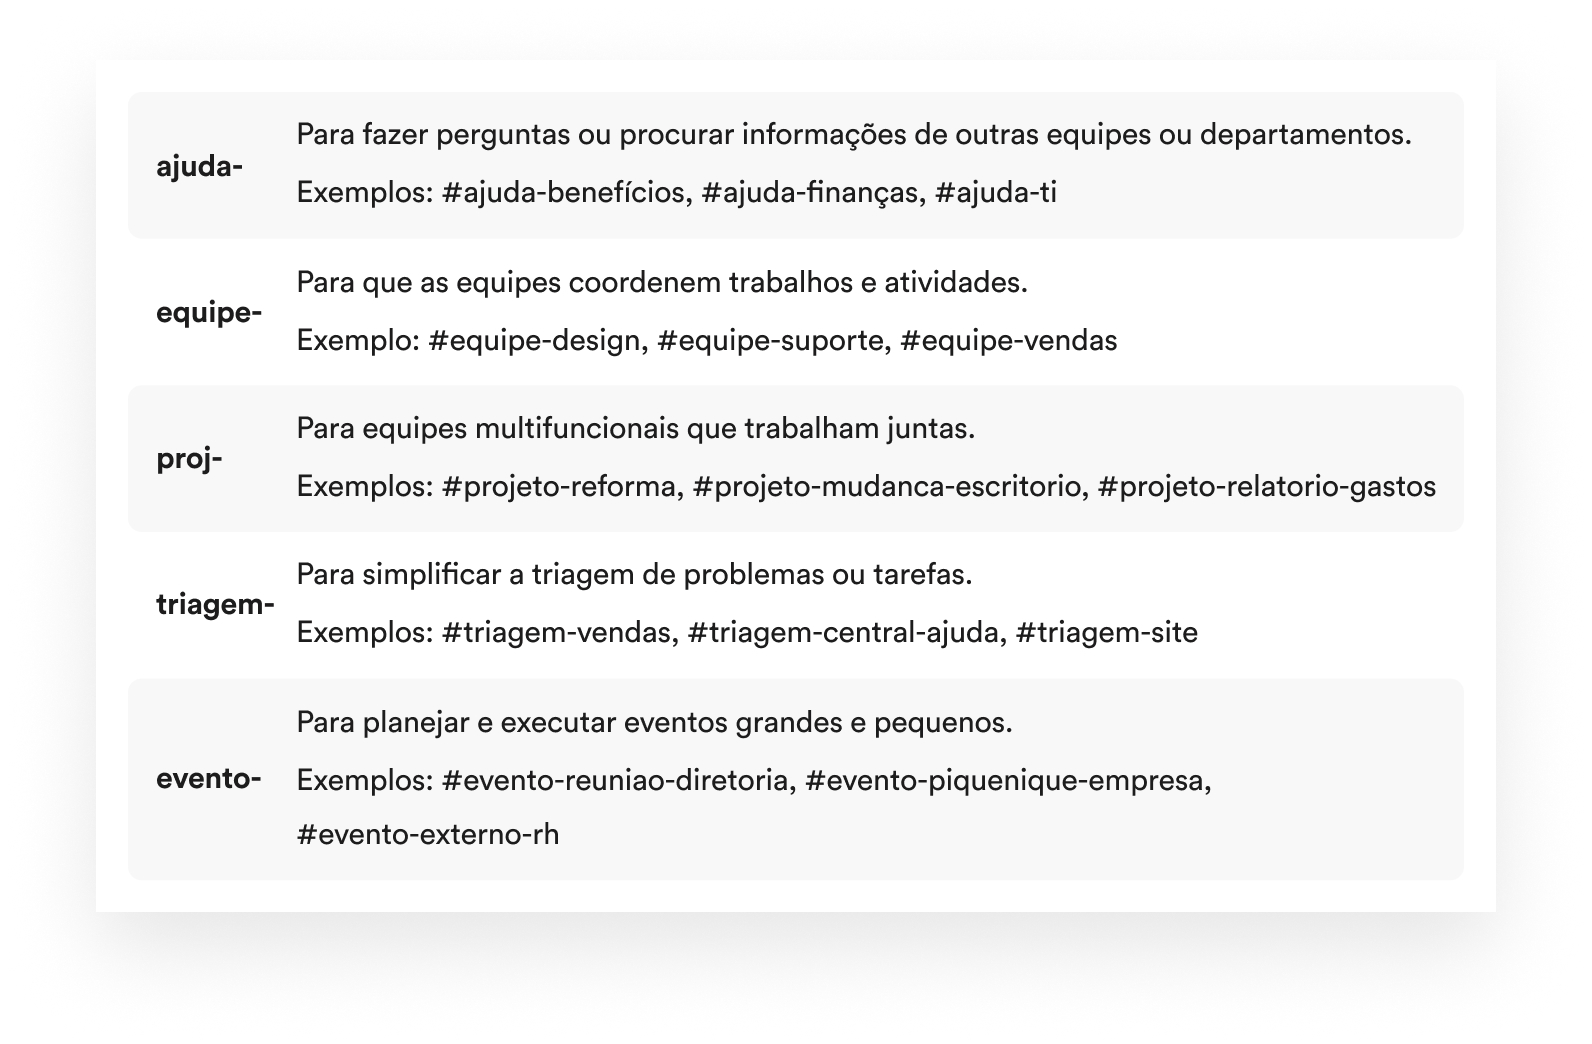 Exemplos de prefixos de canal eficazes no Slack